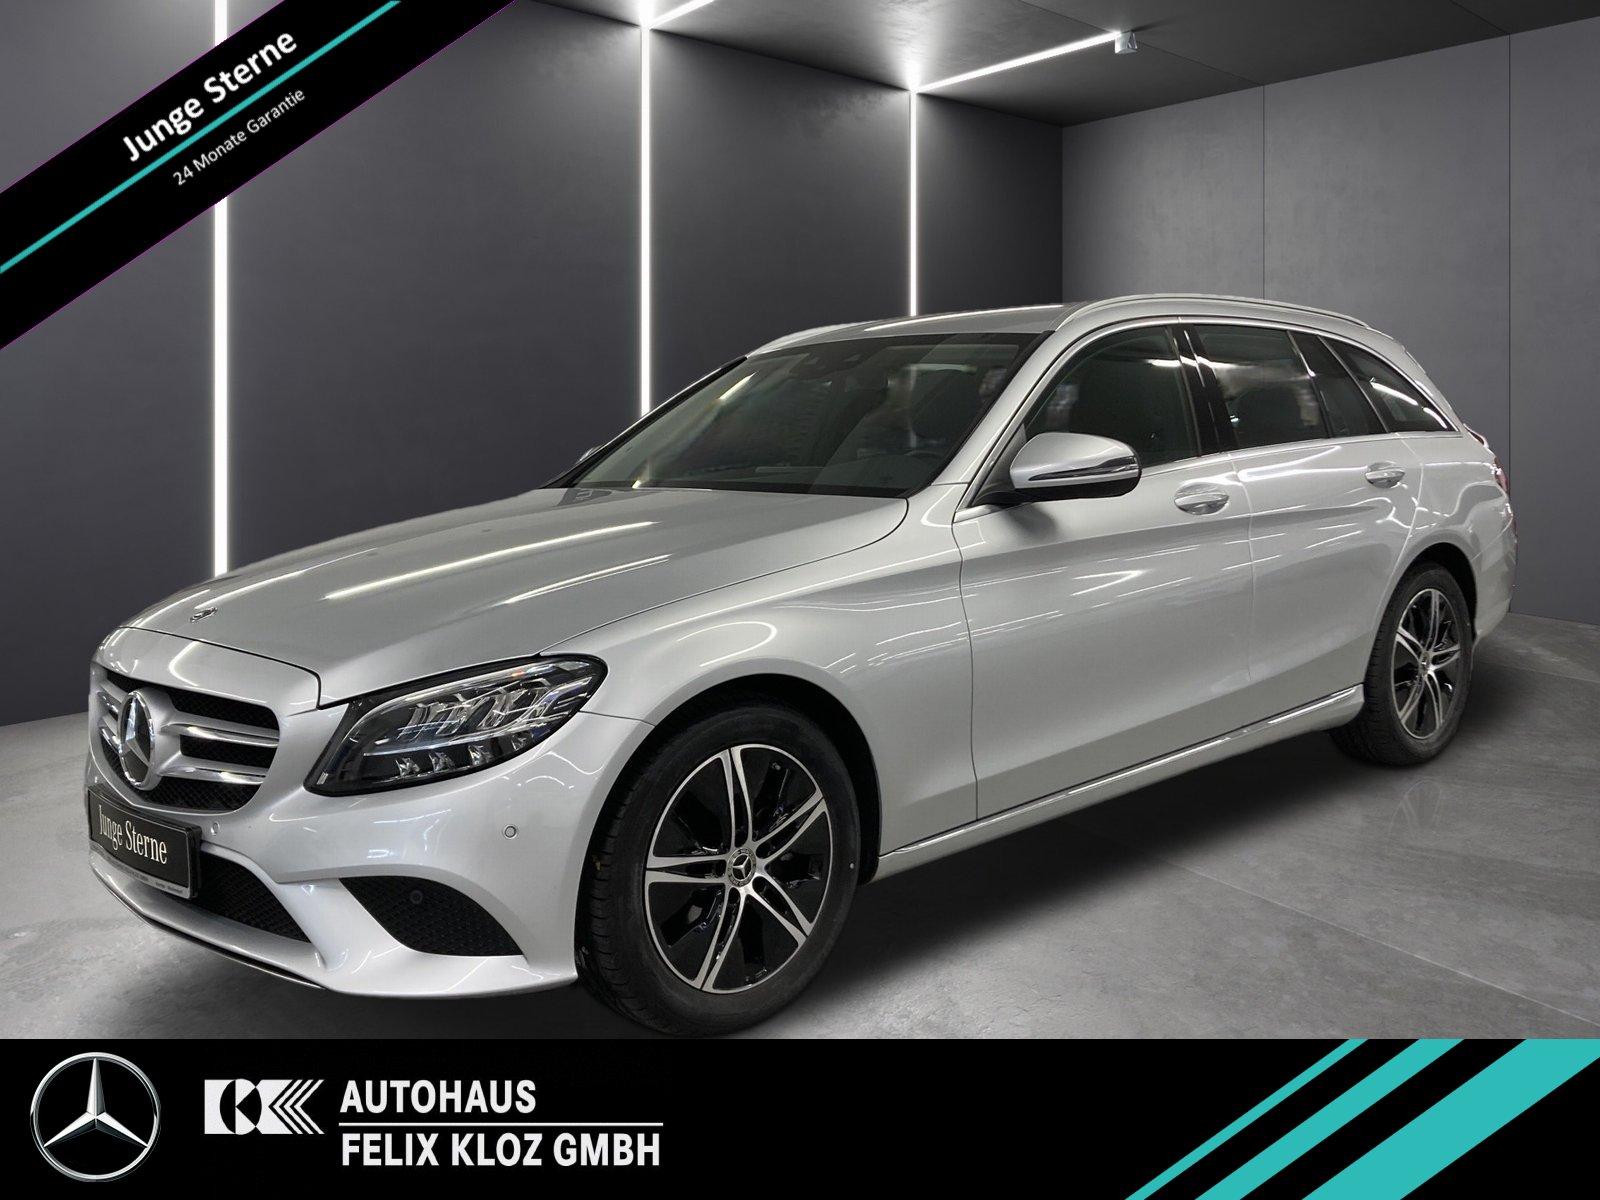 Mercedes-Benz C 200 T Avantgarde*Navi*Kamera*Totwinkel*Spurhal, Jahr 2020, Benzin